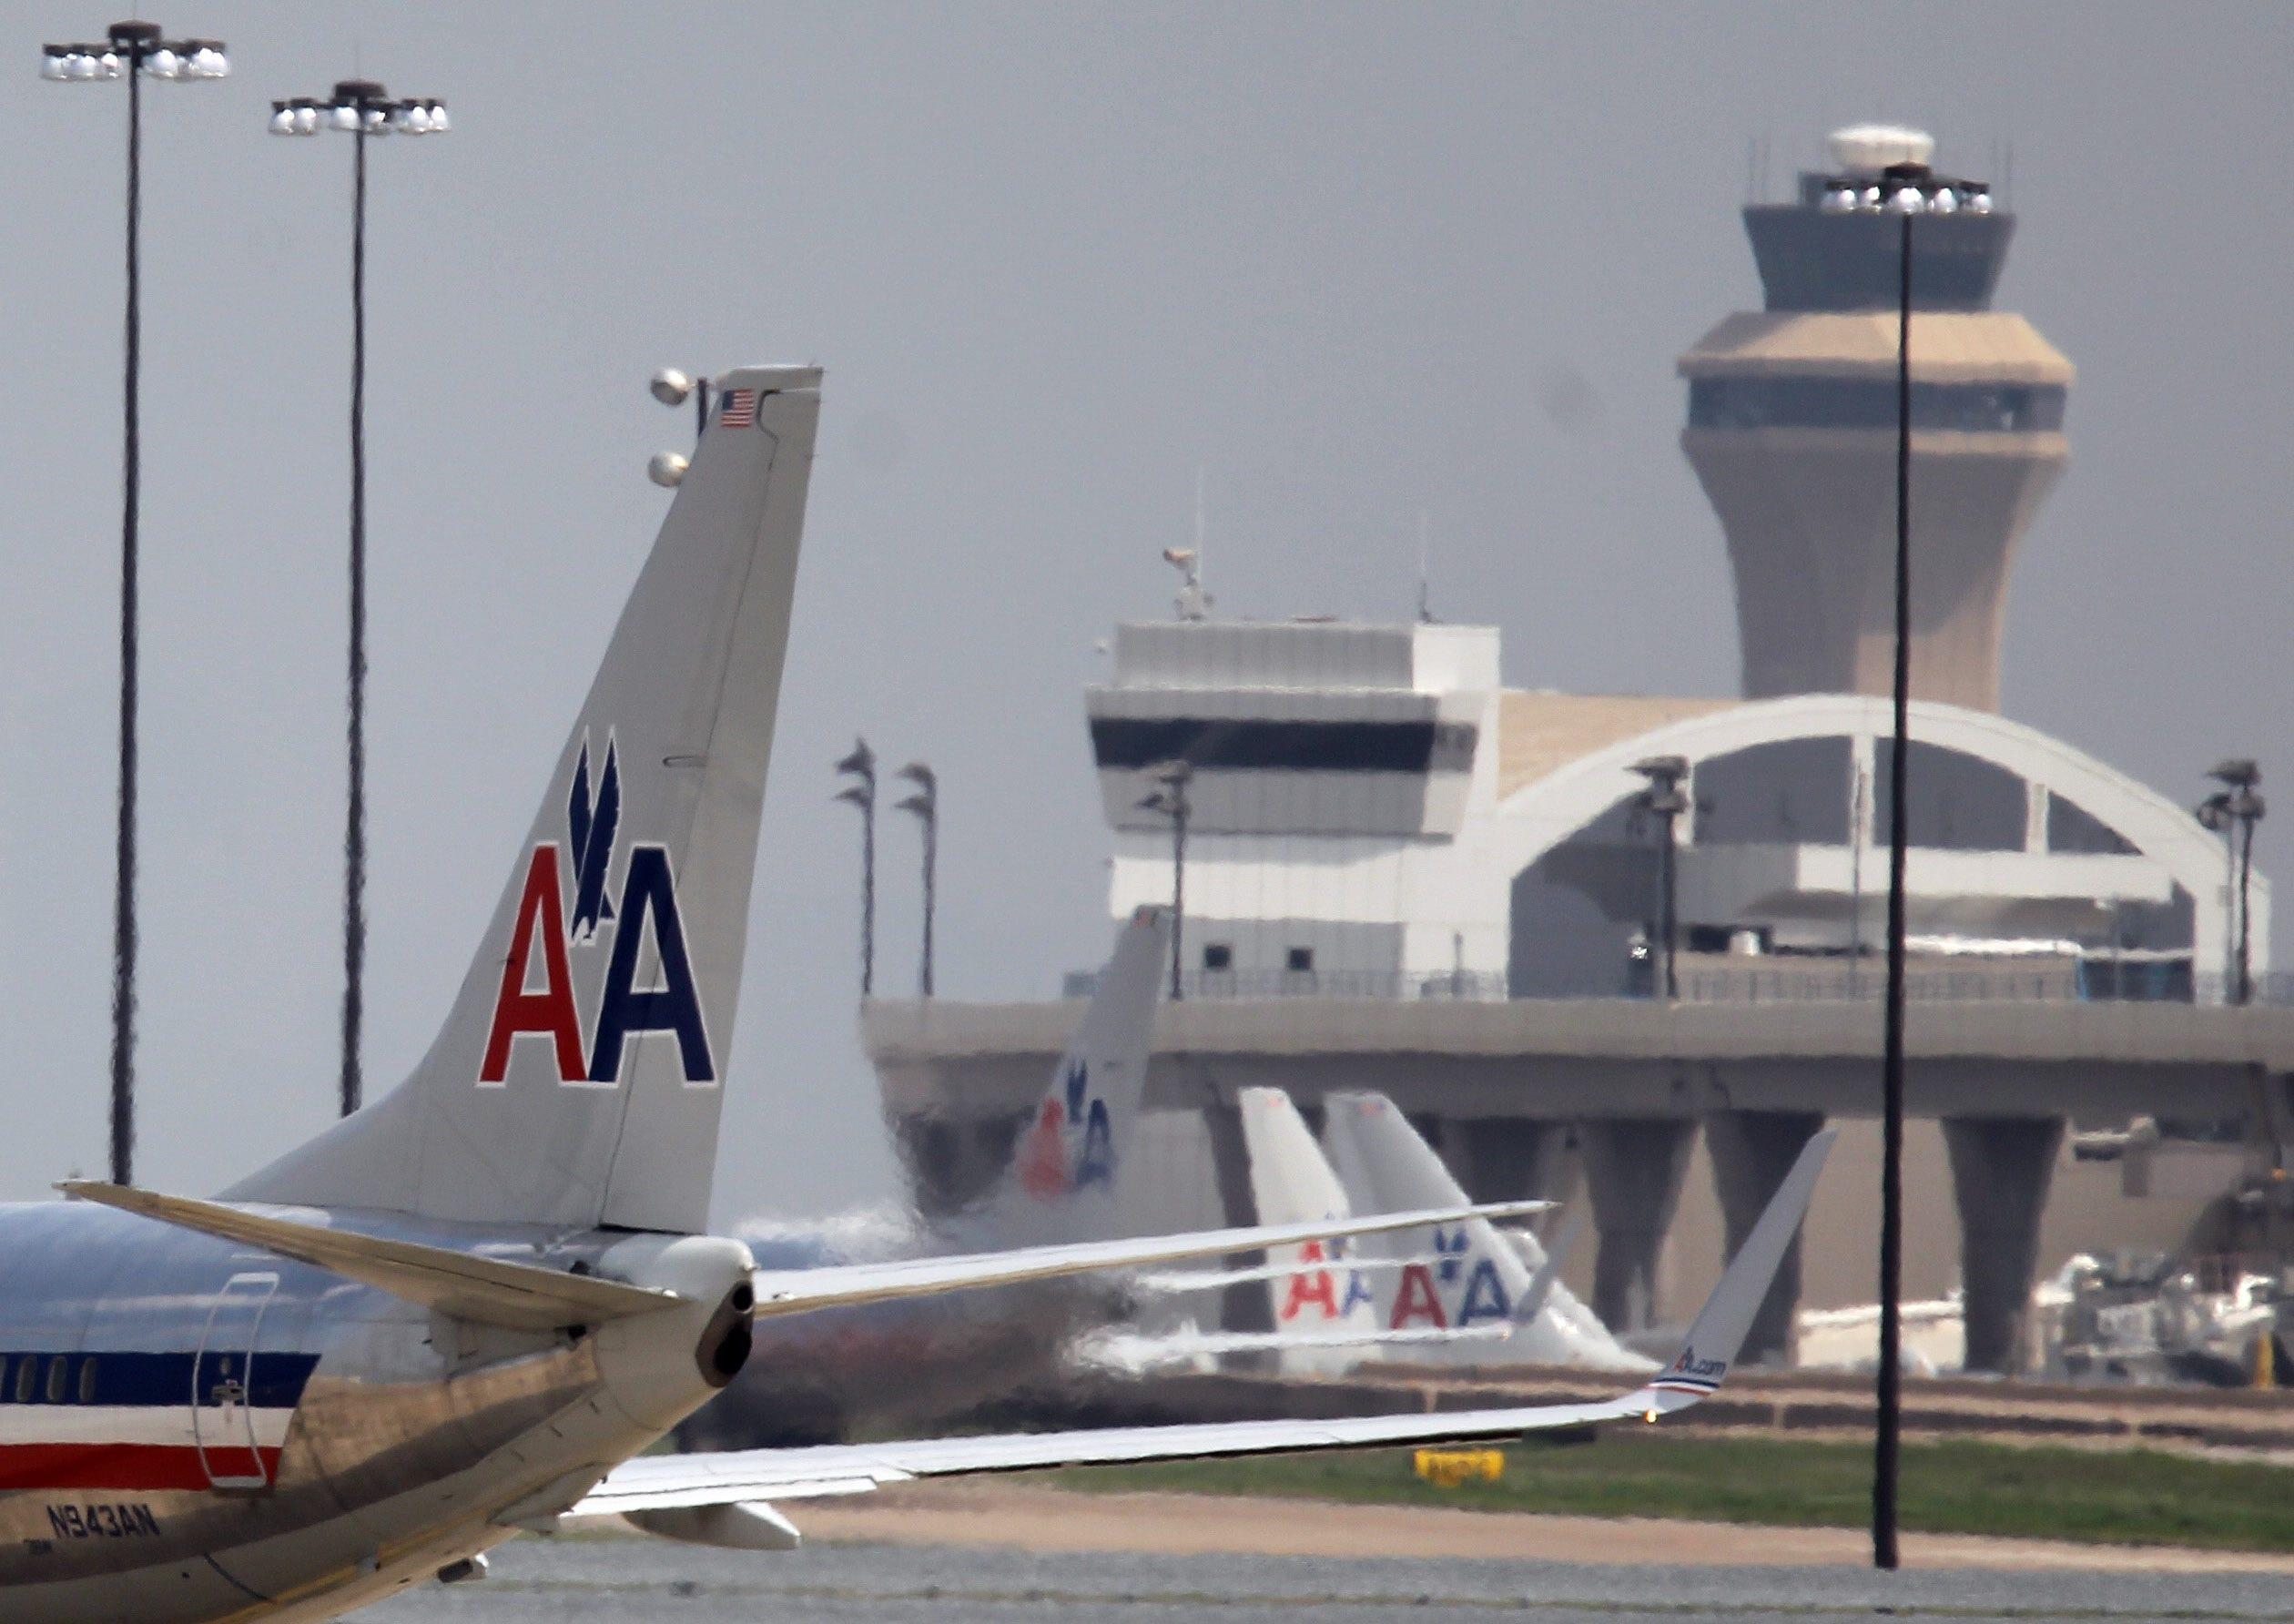 Flights into Dallas resume, lengthy delays still expected